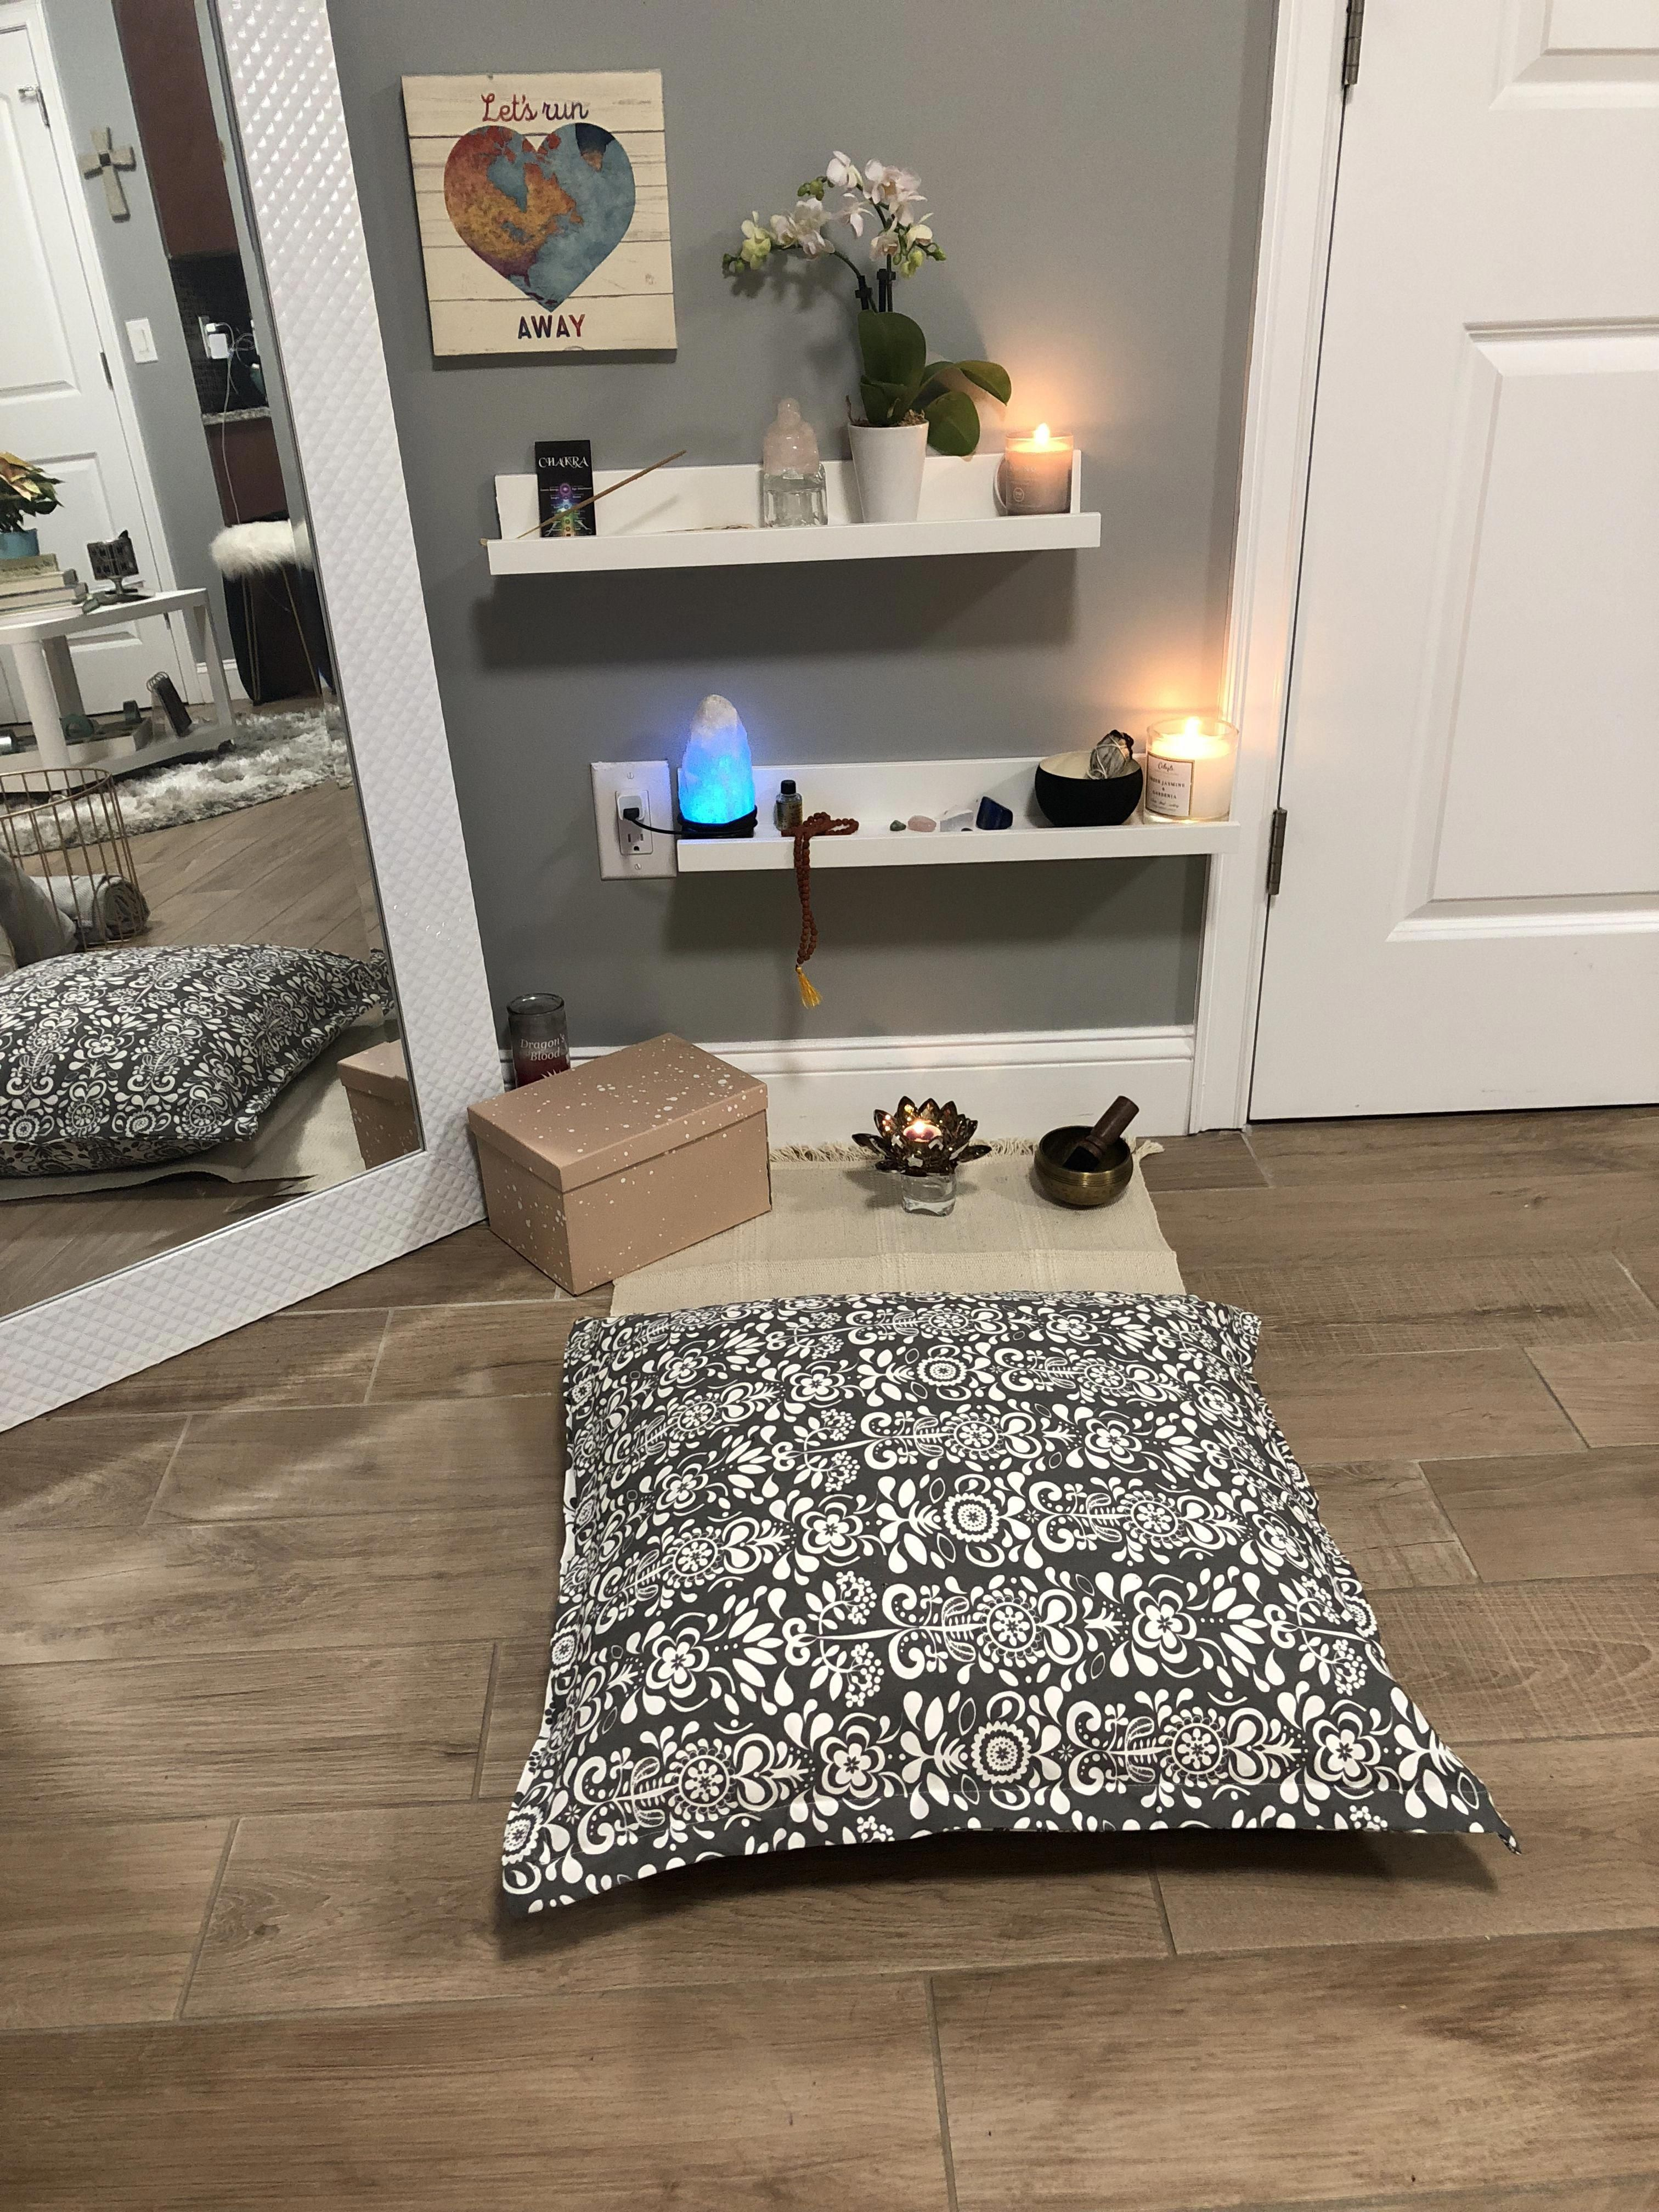 Meditation Room Designs: Decorating Your Meditation Room